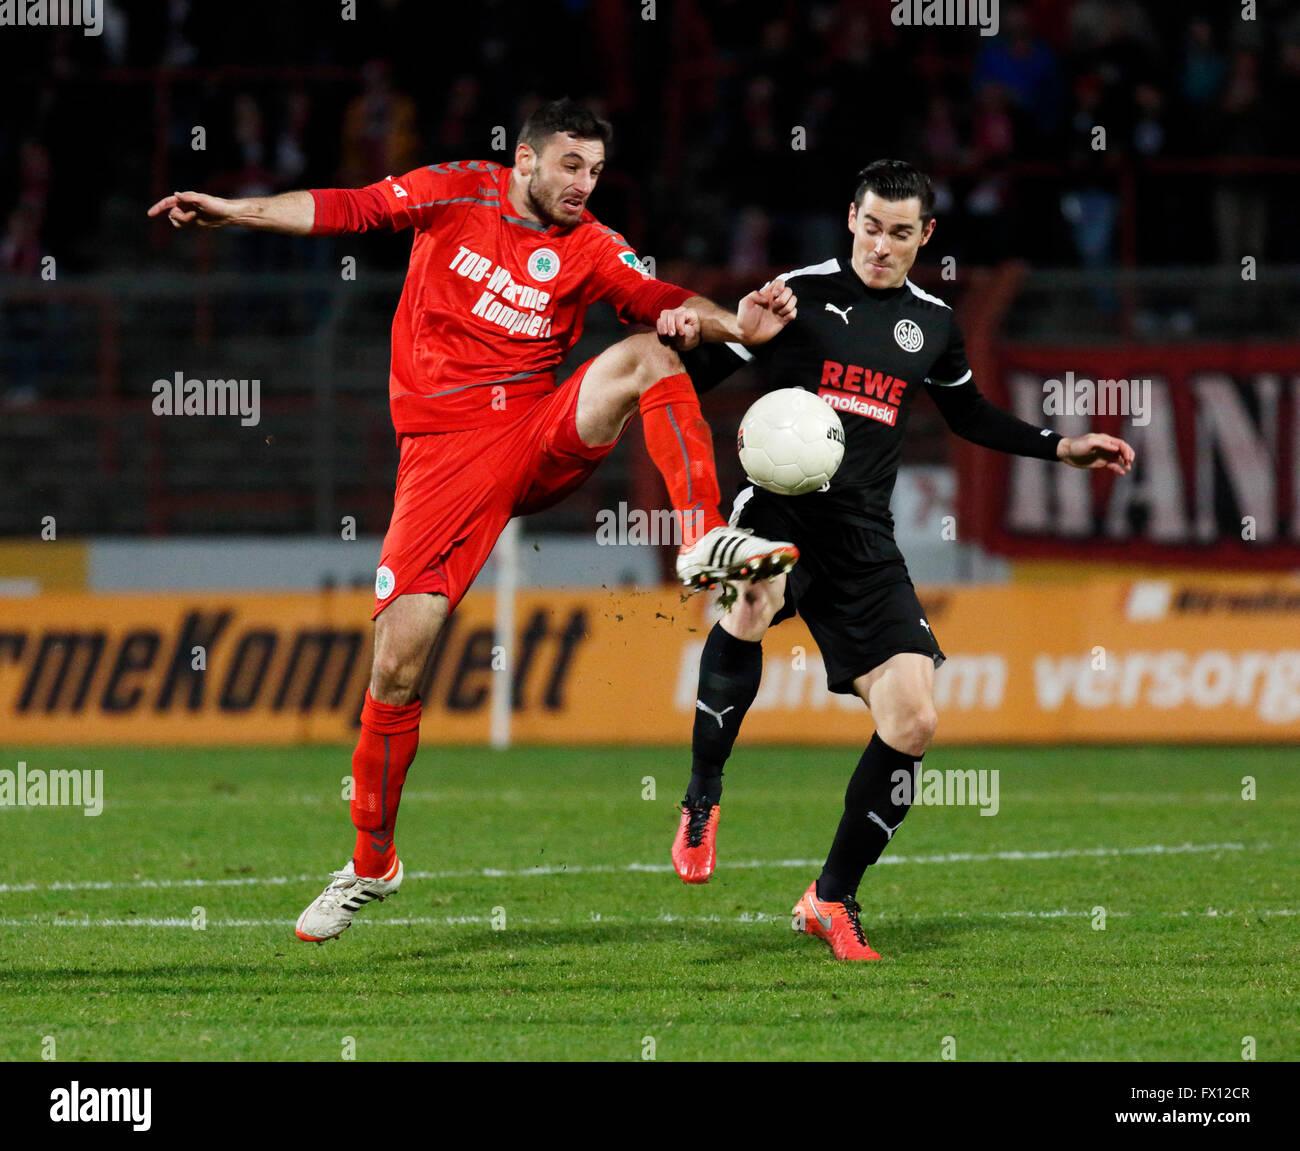 sports, football, Regional League West, 2015/2016, Rot Weiss Oberhausen versus SG Wattenscheid 09 0:0, Stadium Niederrhein - Stock Image